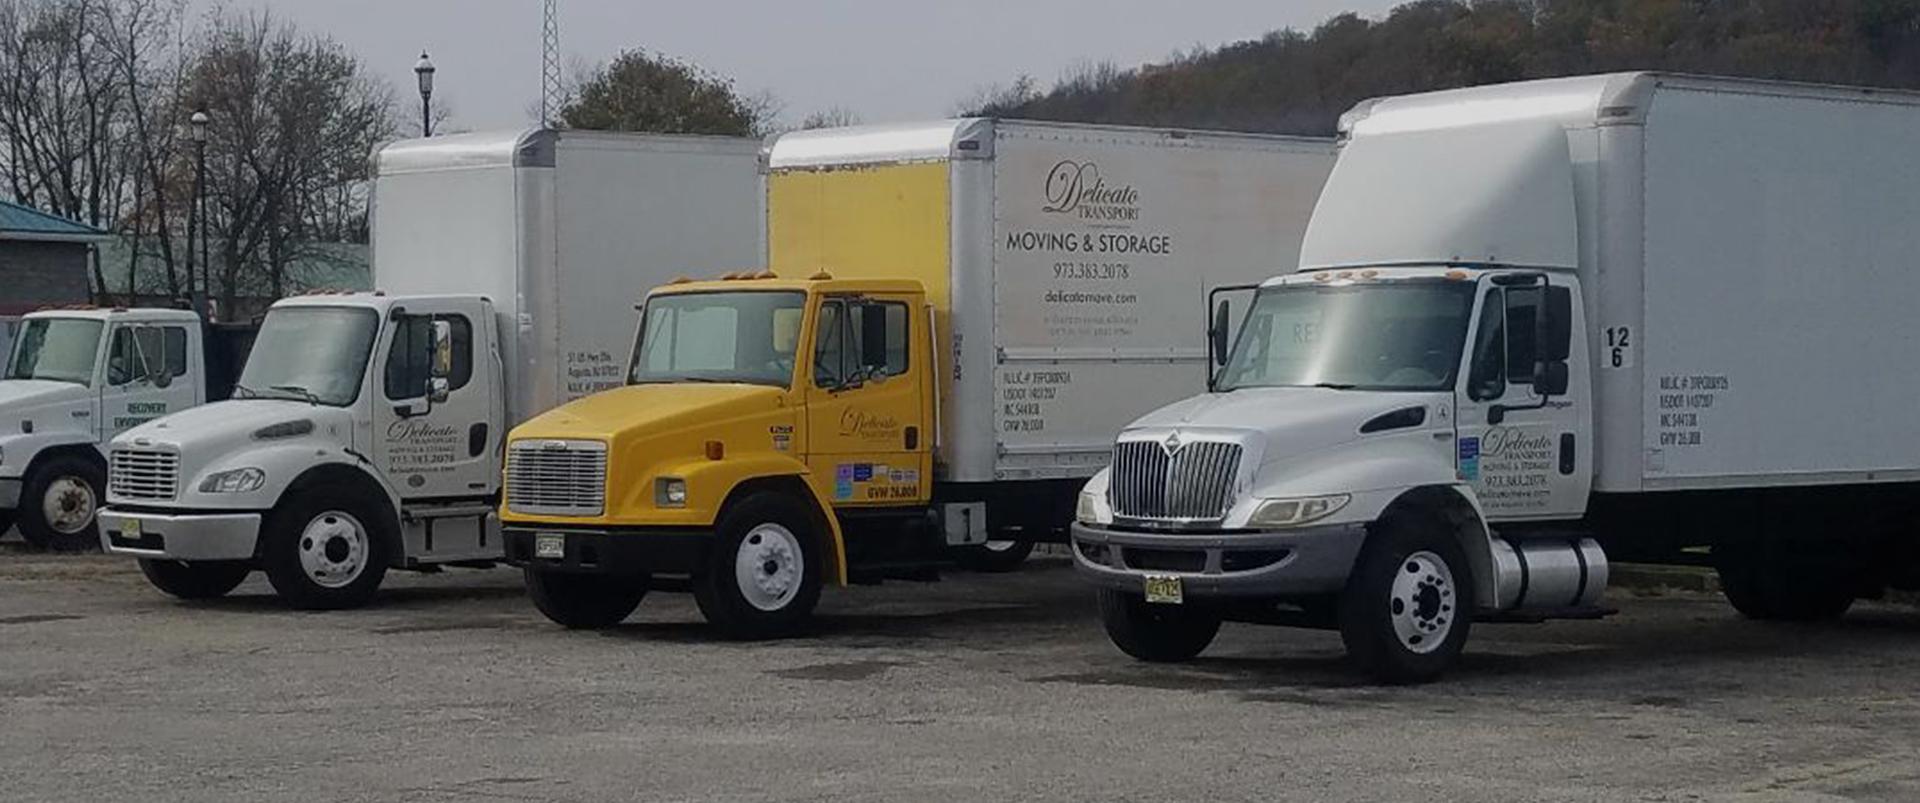 Delicato Transport, LLC